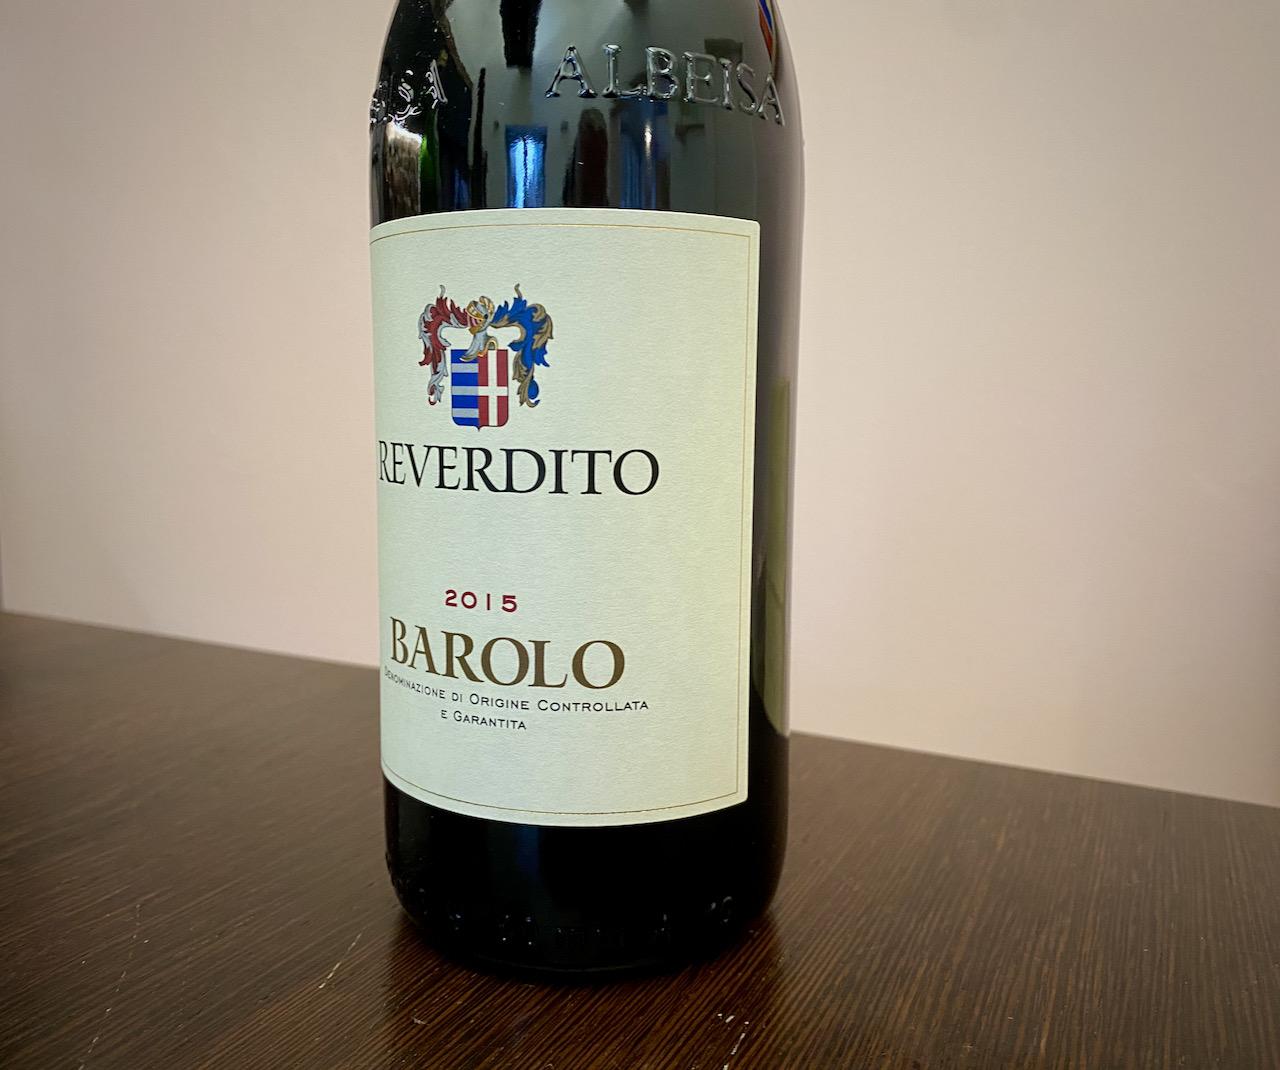 It's Barolo time